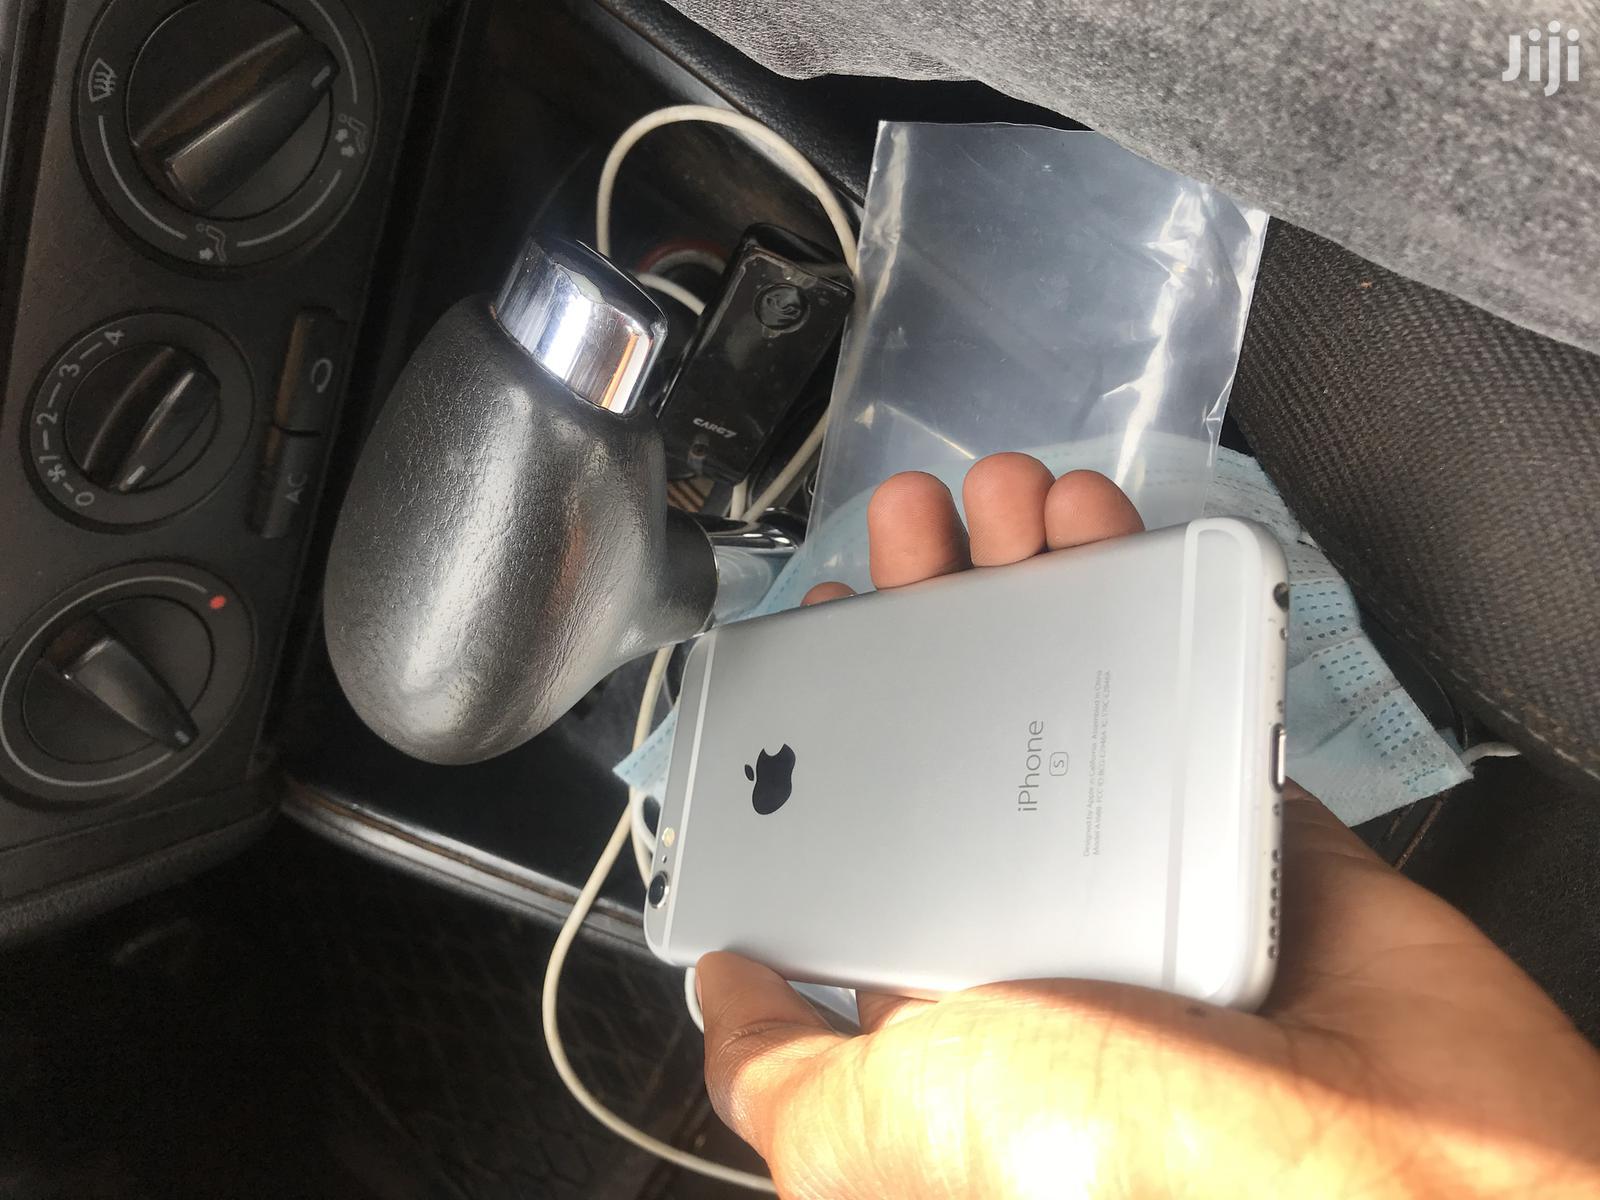 Apple iPhone 6s 32 GB Silver   Mobile Phones for sale in Kampala, Central Region, Uganda